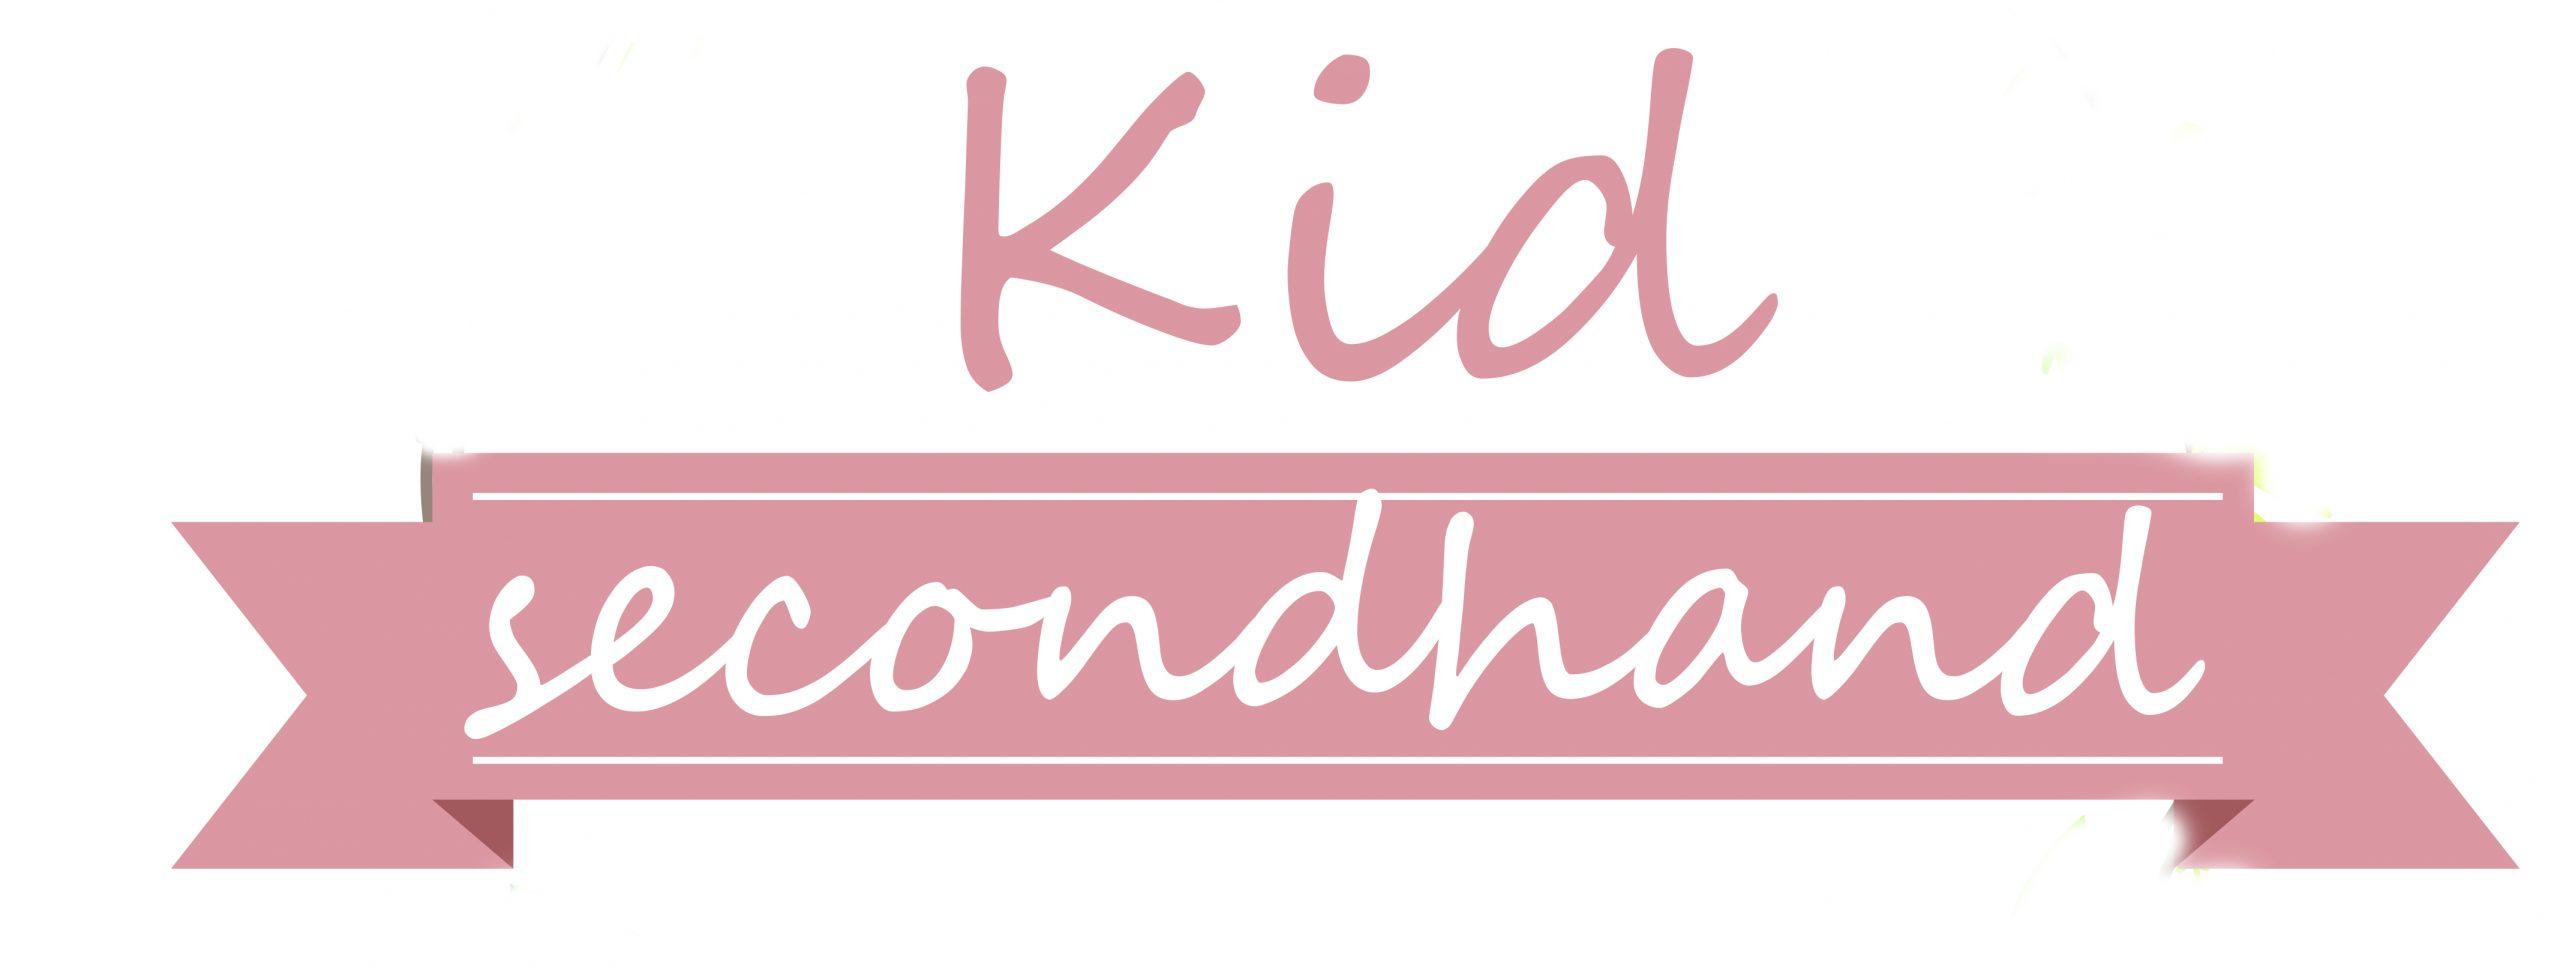 Kidsecondhand